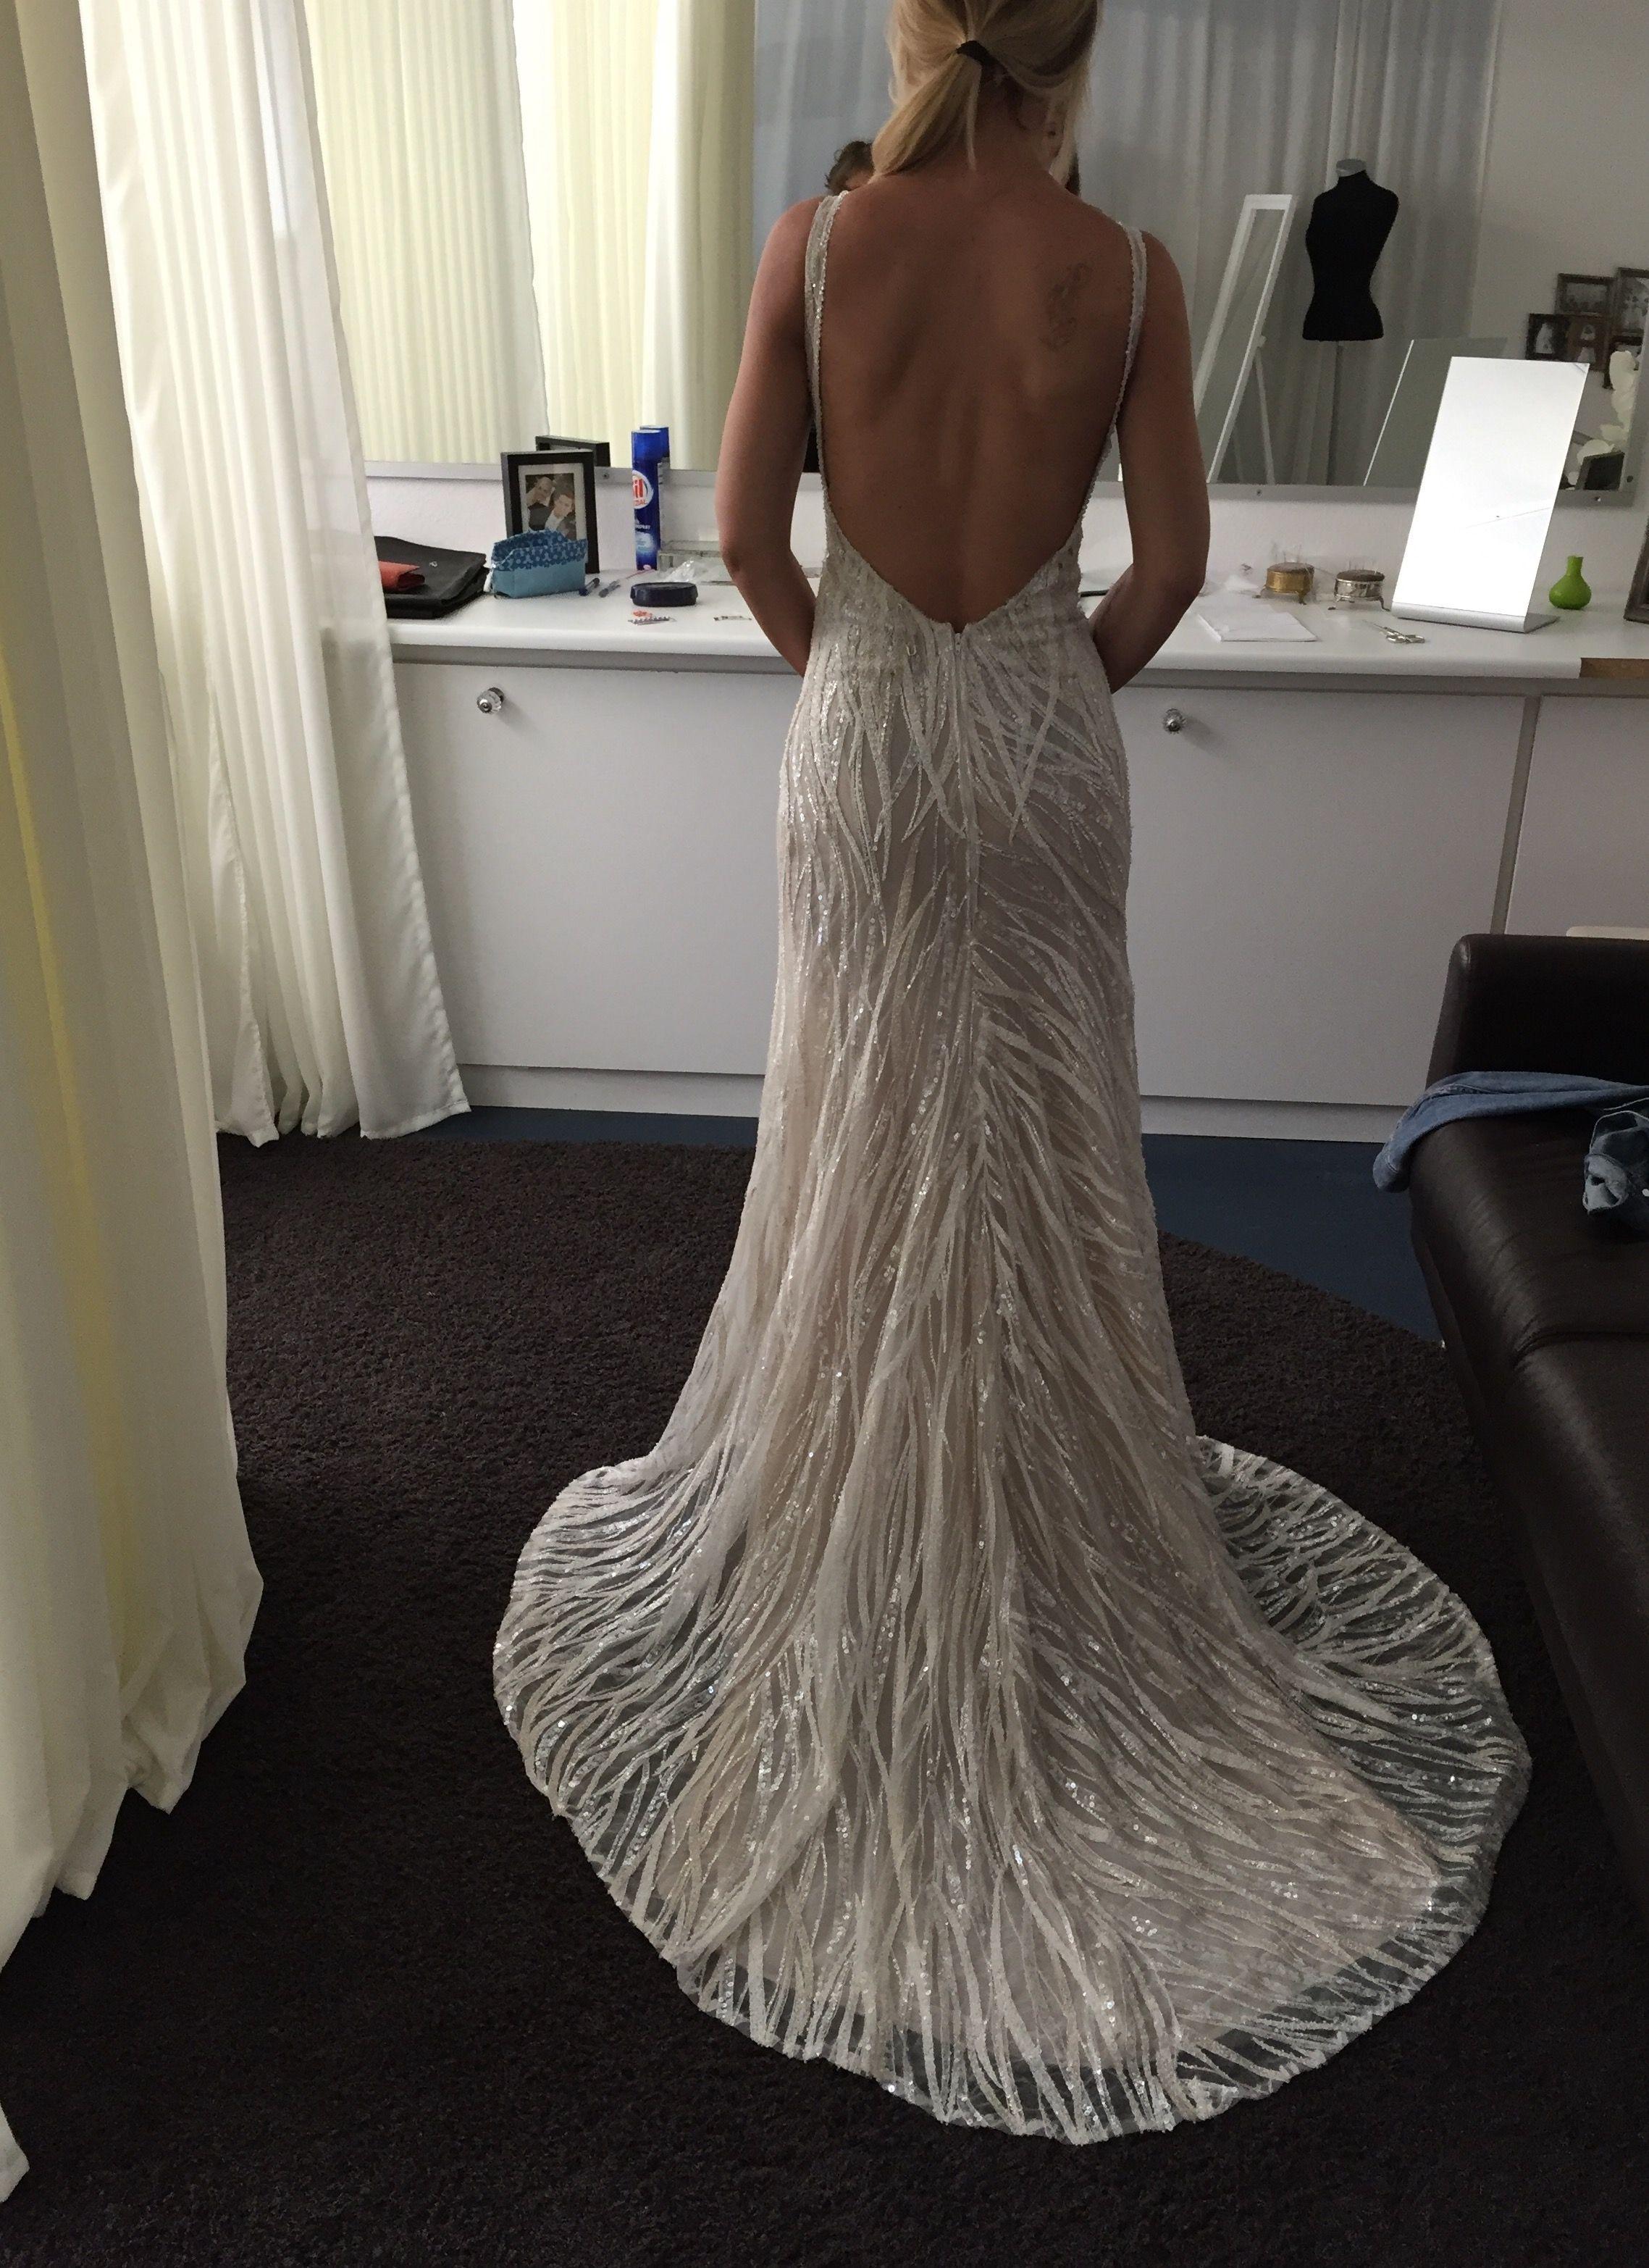 Berta Bridal - Brautkleid Berta 15-122 2015, Duchesse Seide ...